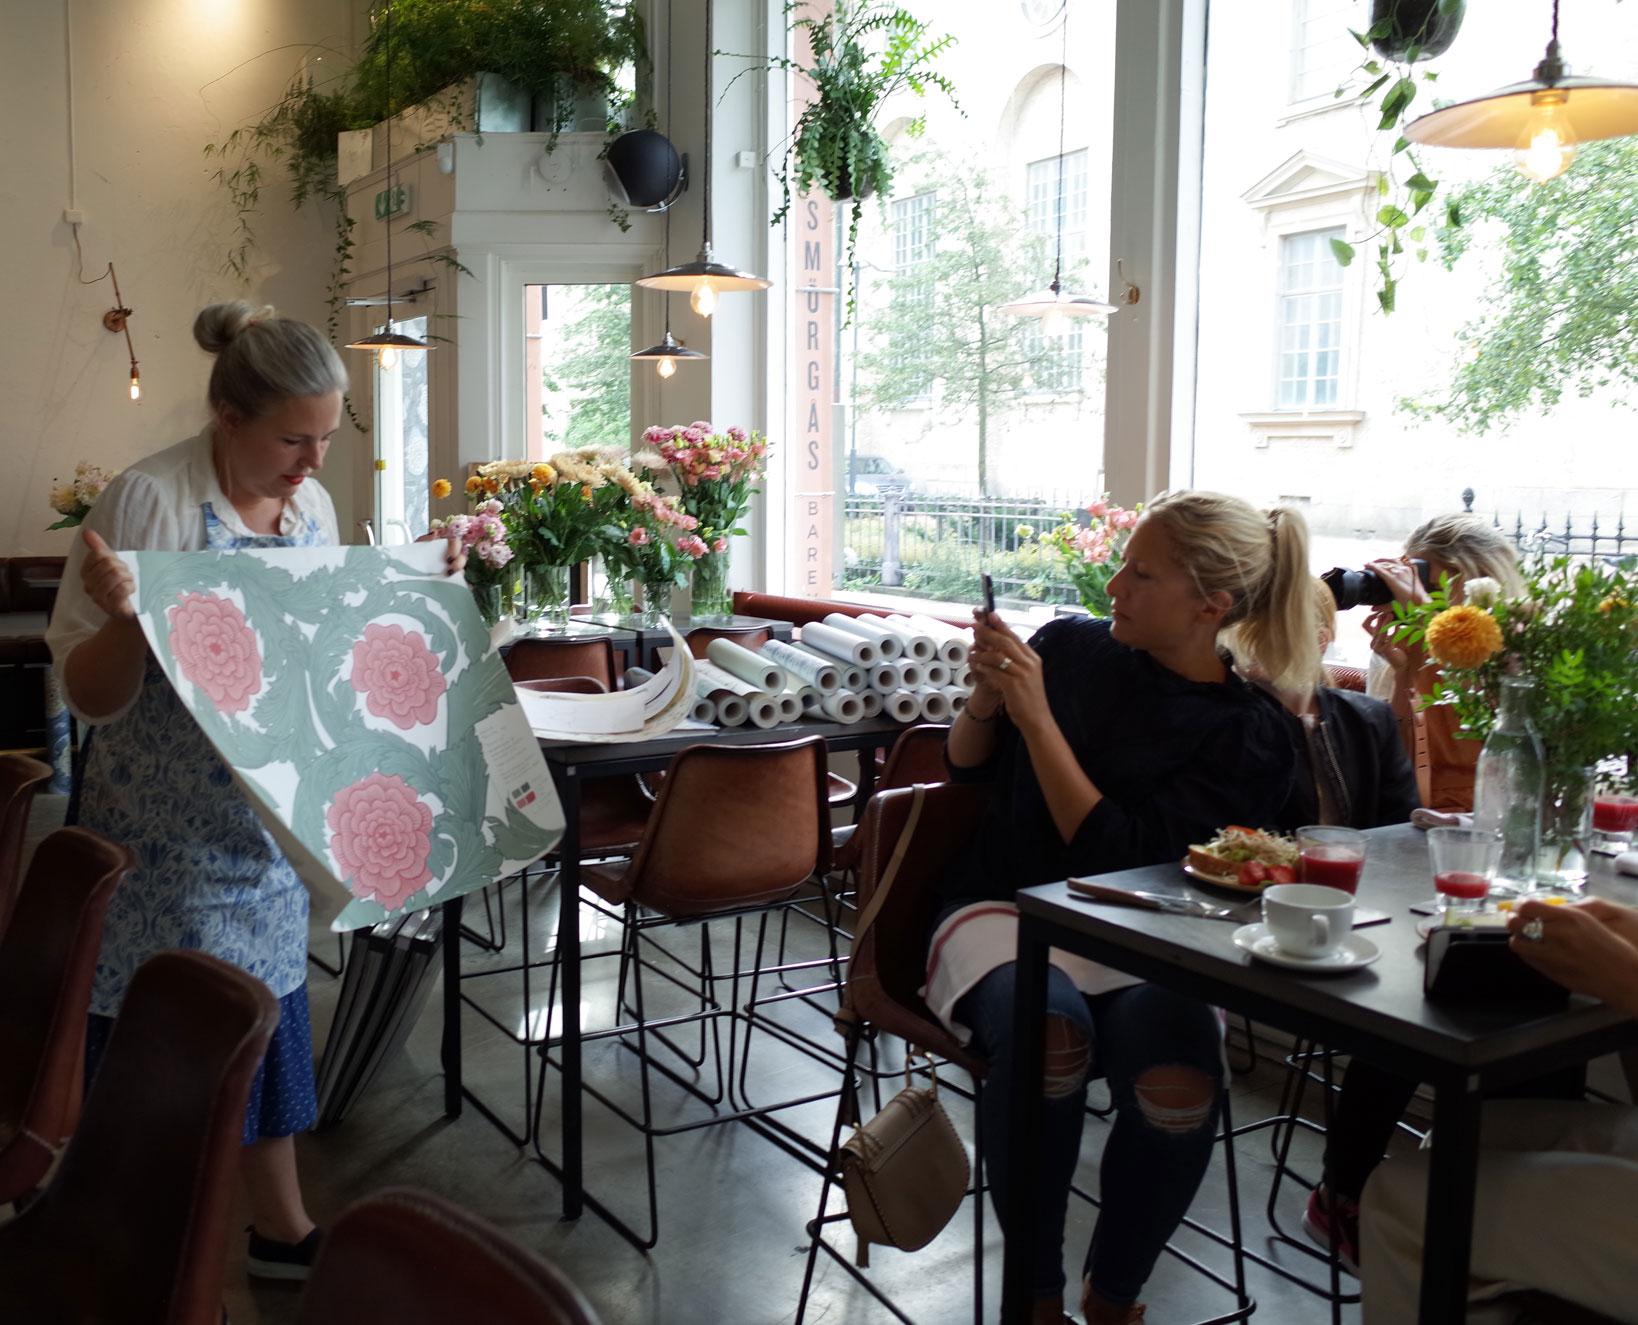 tapetfrukost-hanna-wendelbo-lansering-blomstermåla-smörgåsbaren-midbec